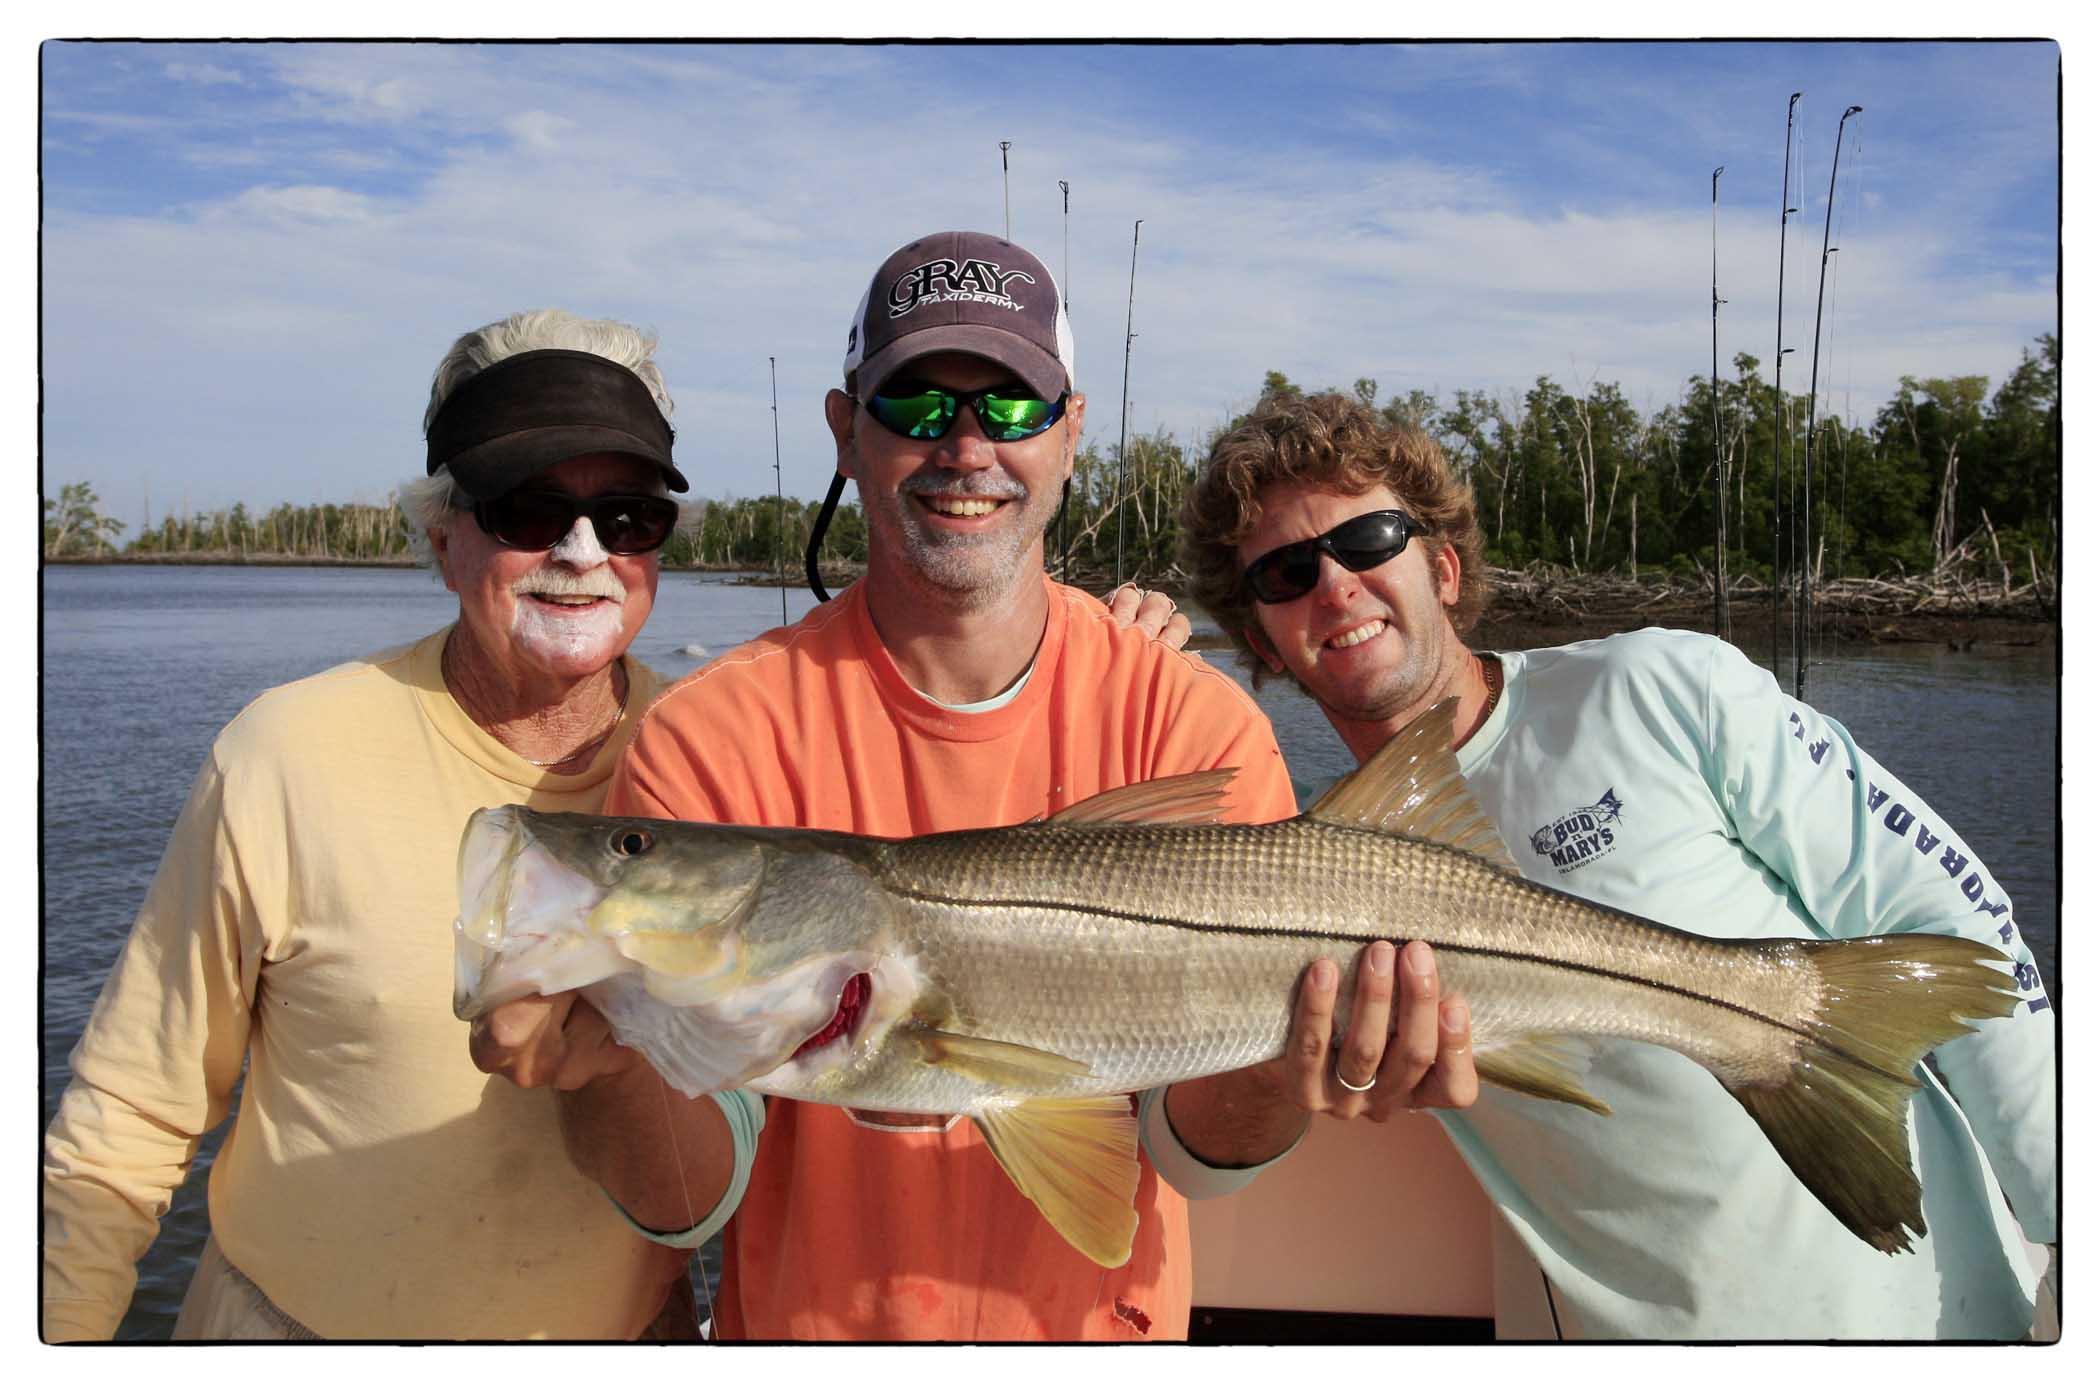 11 13 12 november islamorada fishing in the everglades for Key largo fishing guides